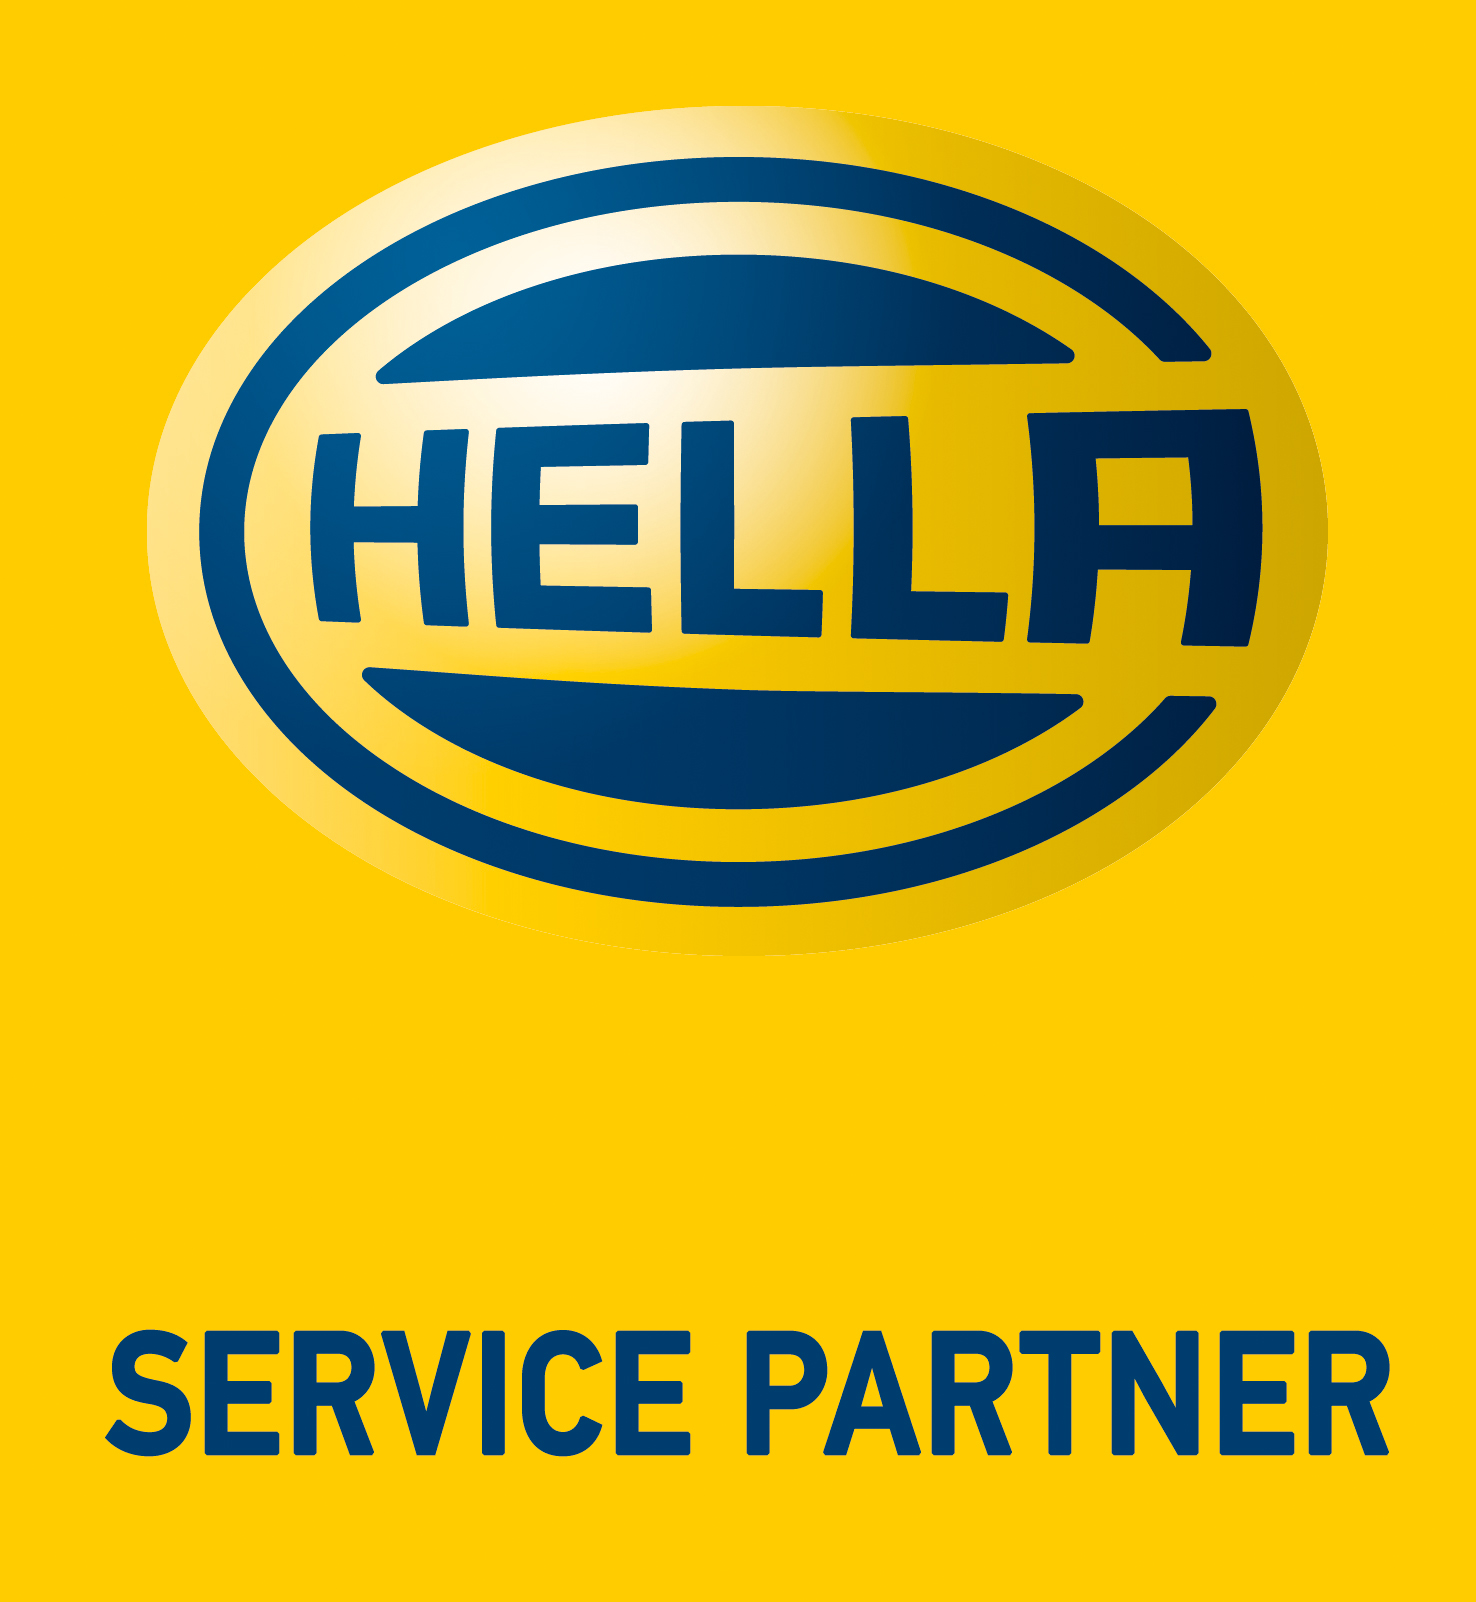 Hella Service Partner i Esbjerg logo